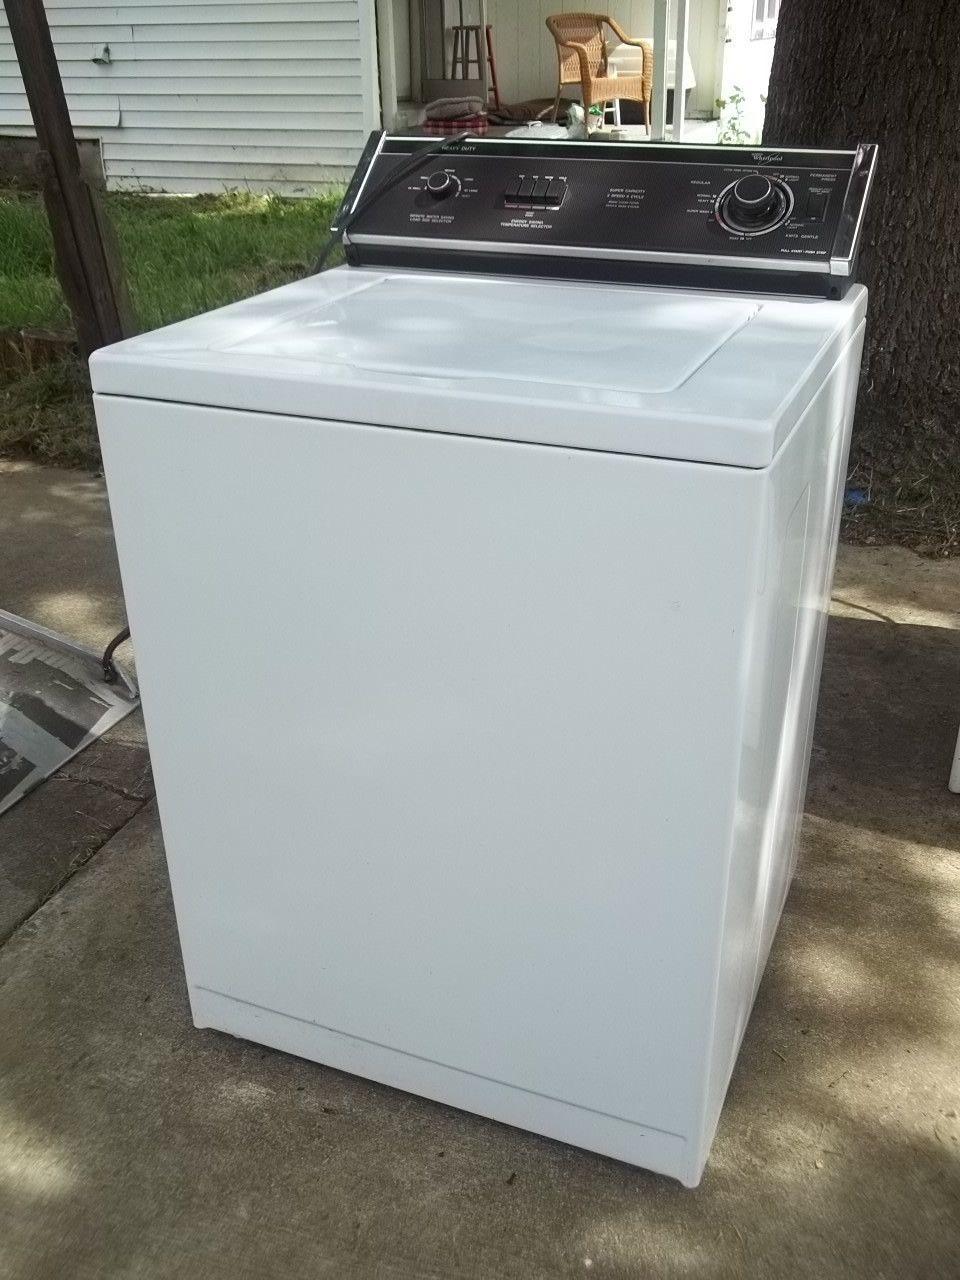 whirlpool washing machine heavy duty white 10581 vintage appliances washing machine vintage. Black Bedroom Furniture Sets. Home Design Ideas